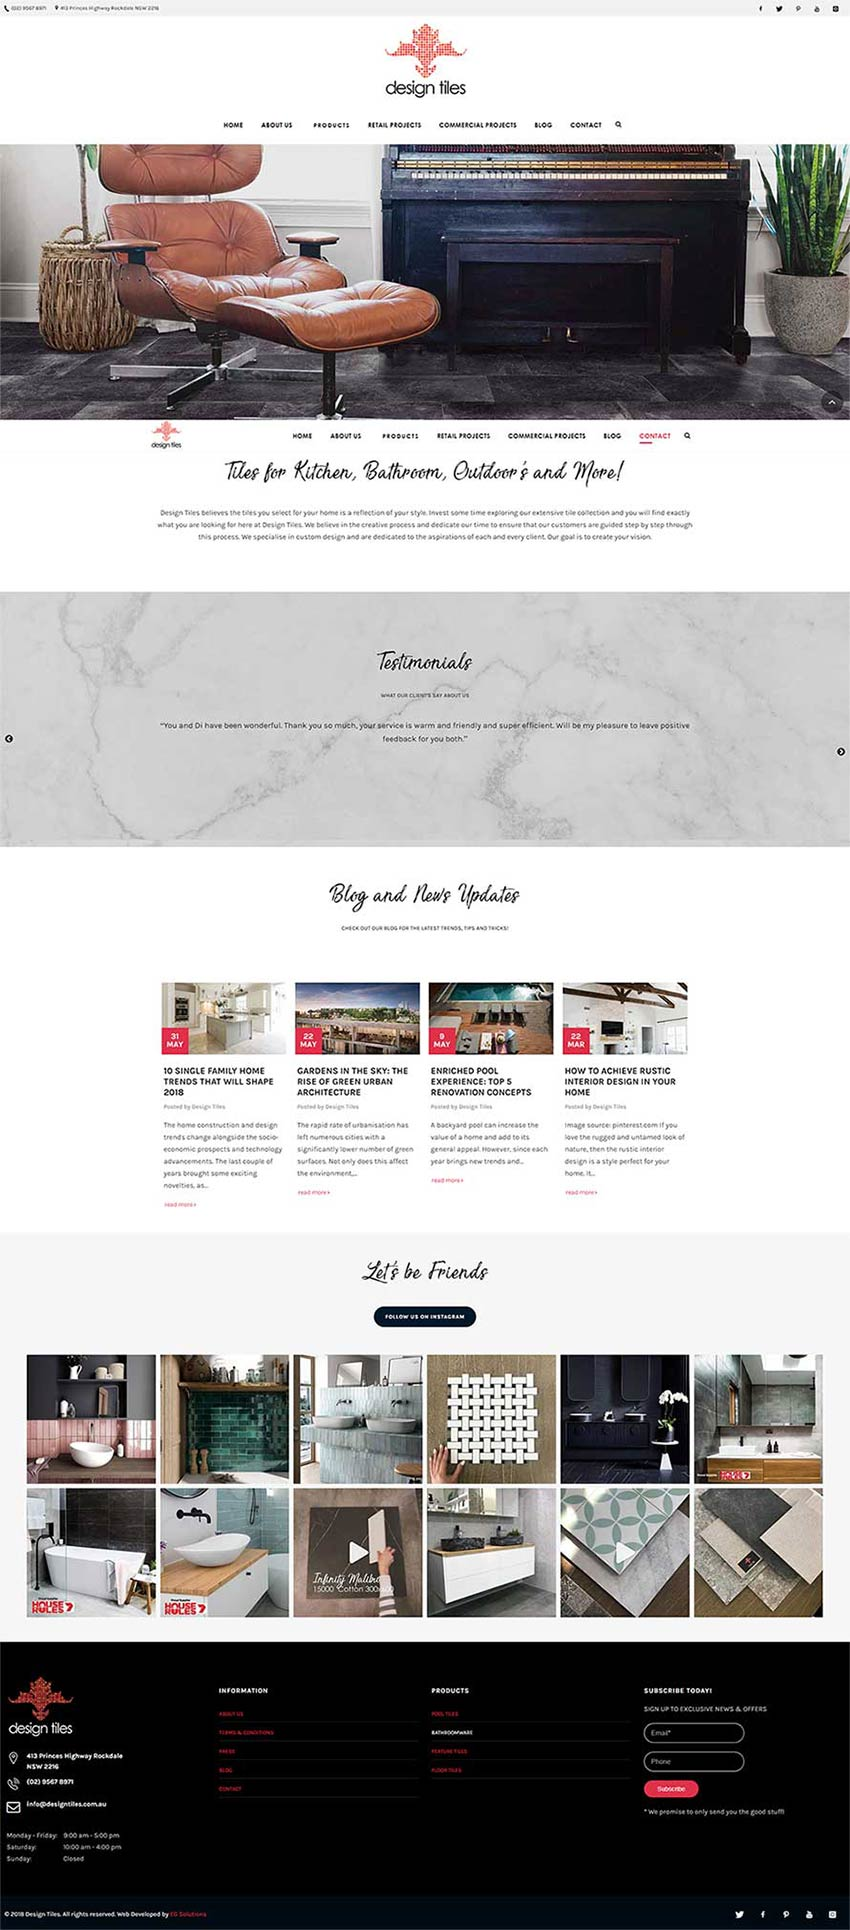 Design Tiles Homepage Design